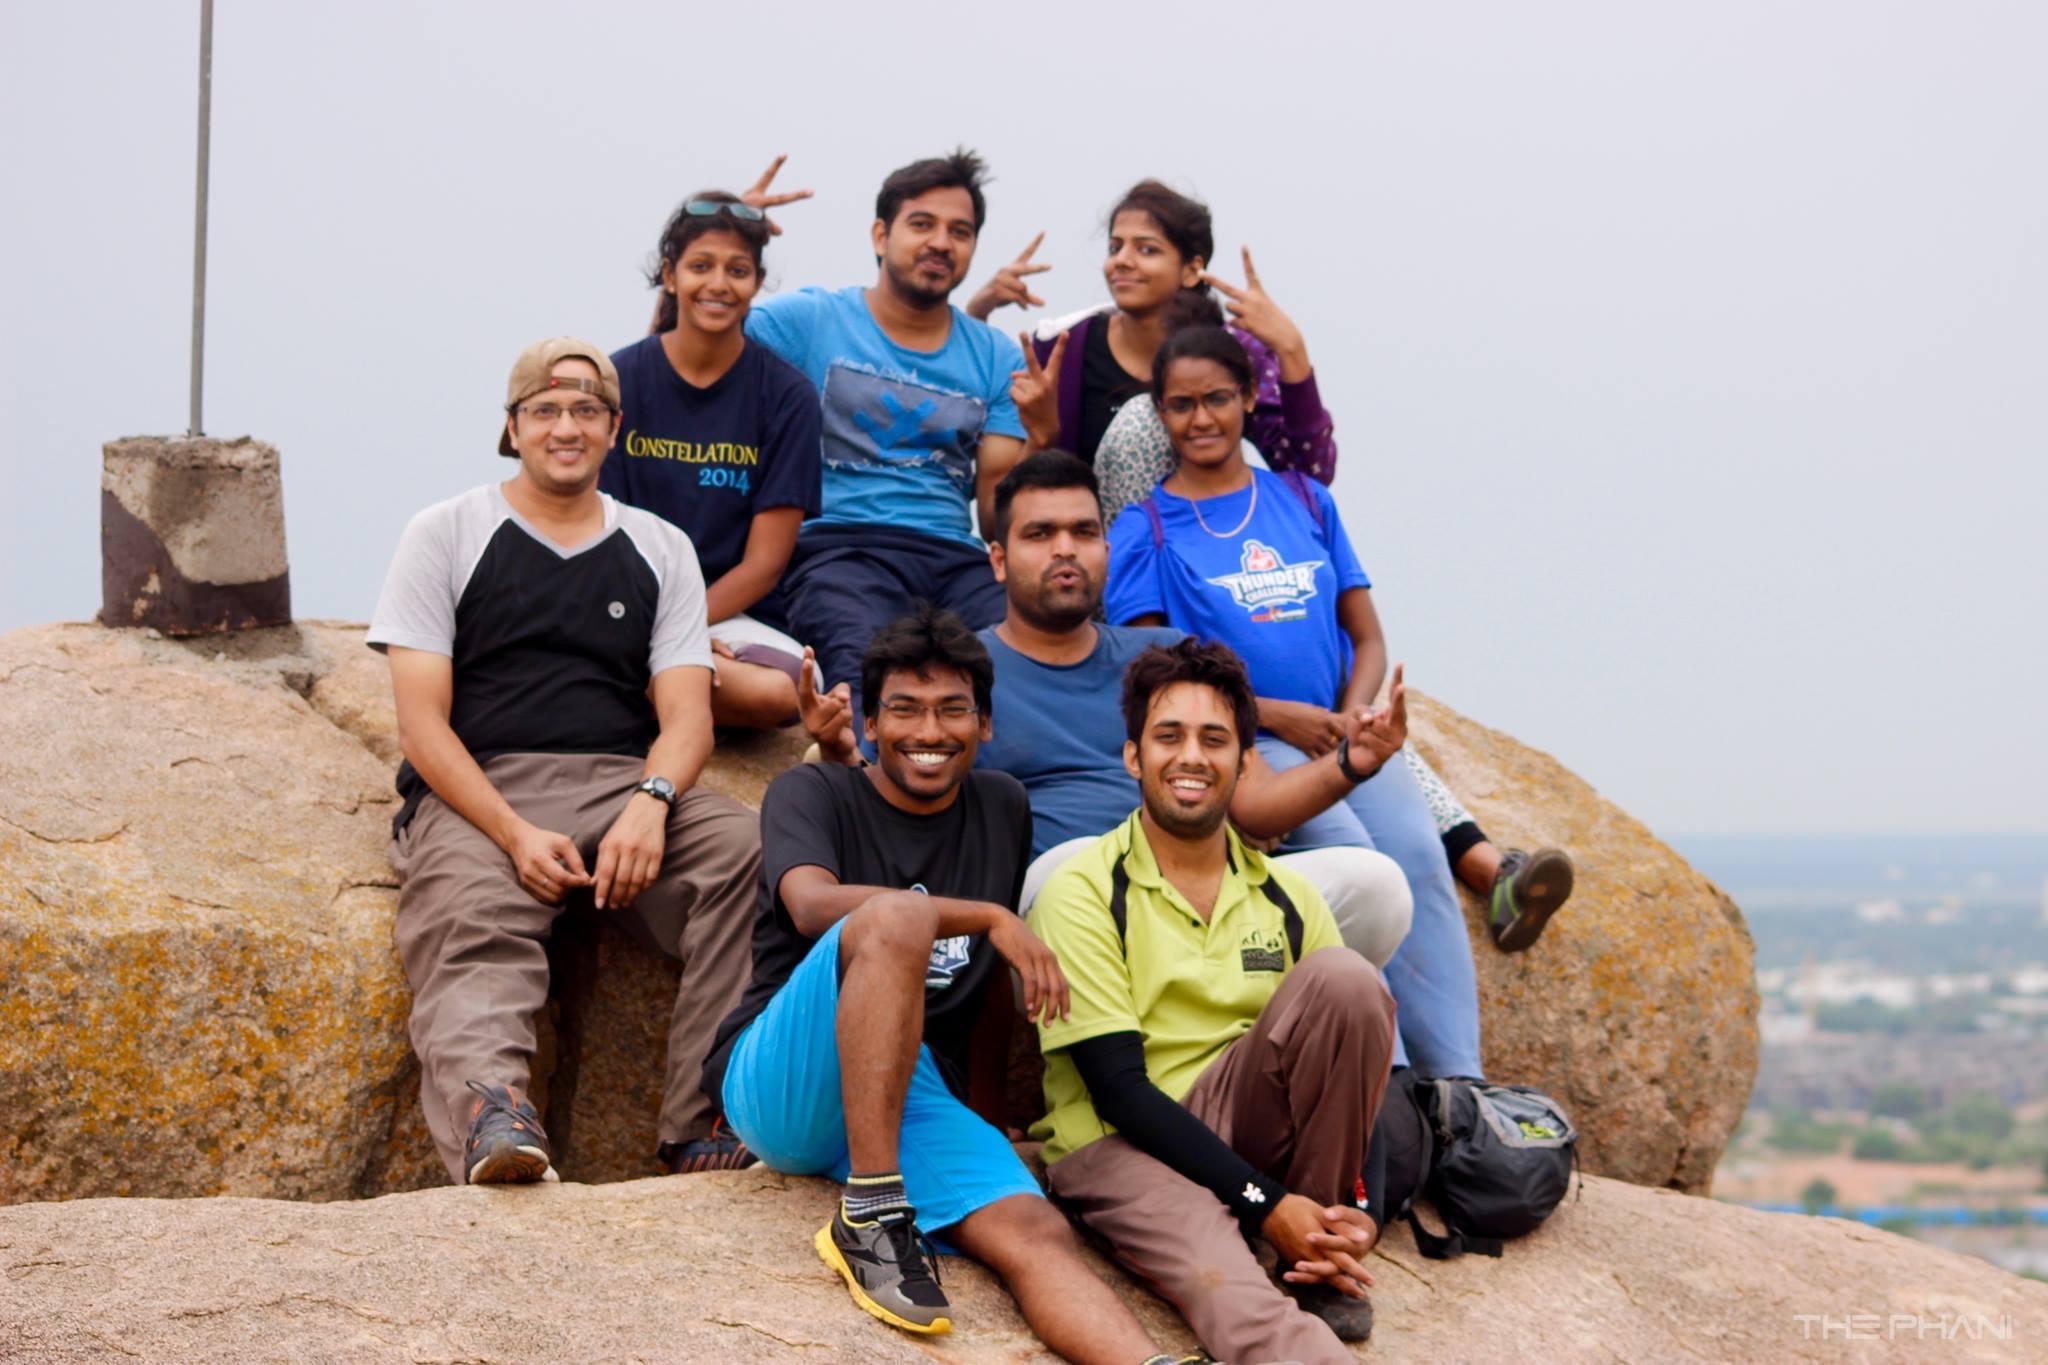 Our Trek Team